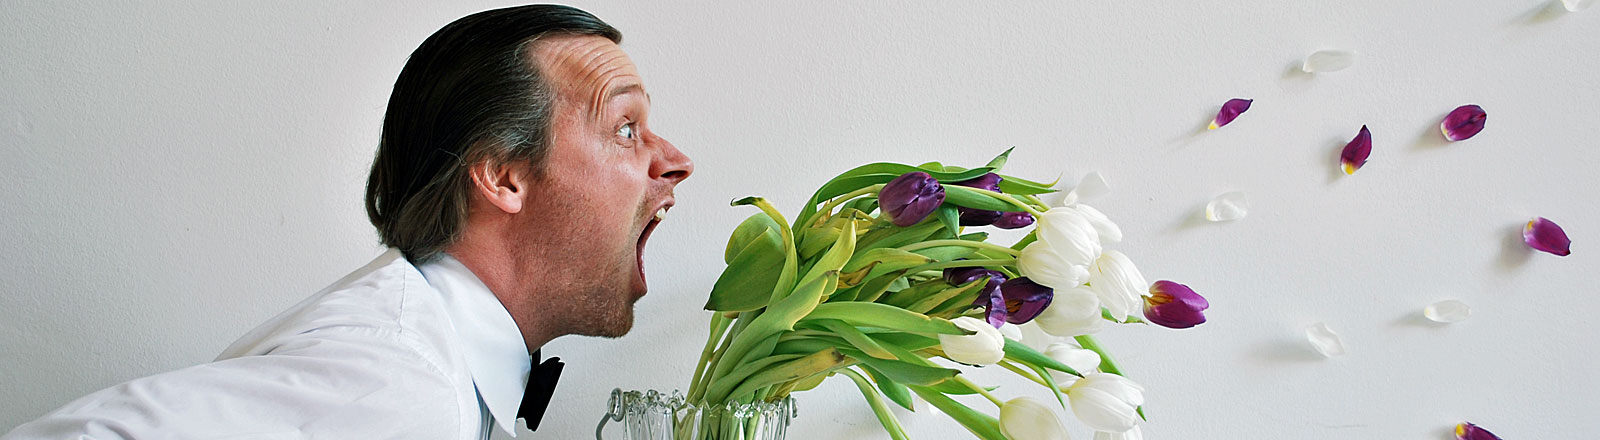 Mann schreit Blumen an